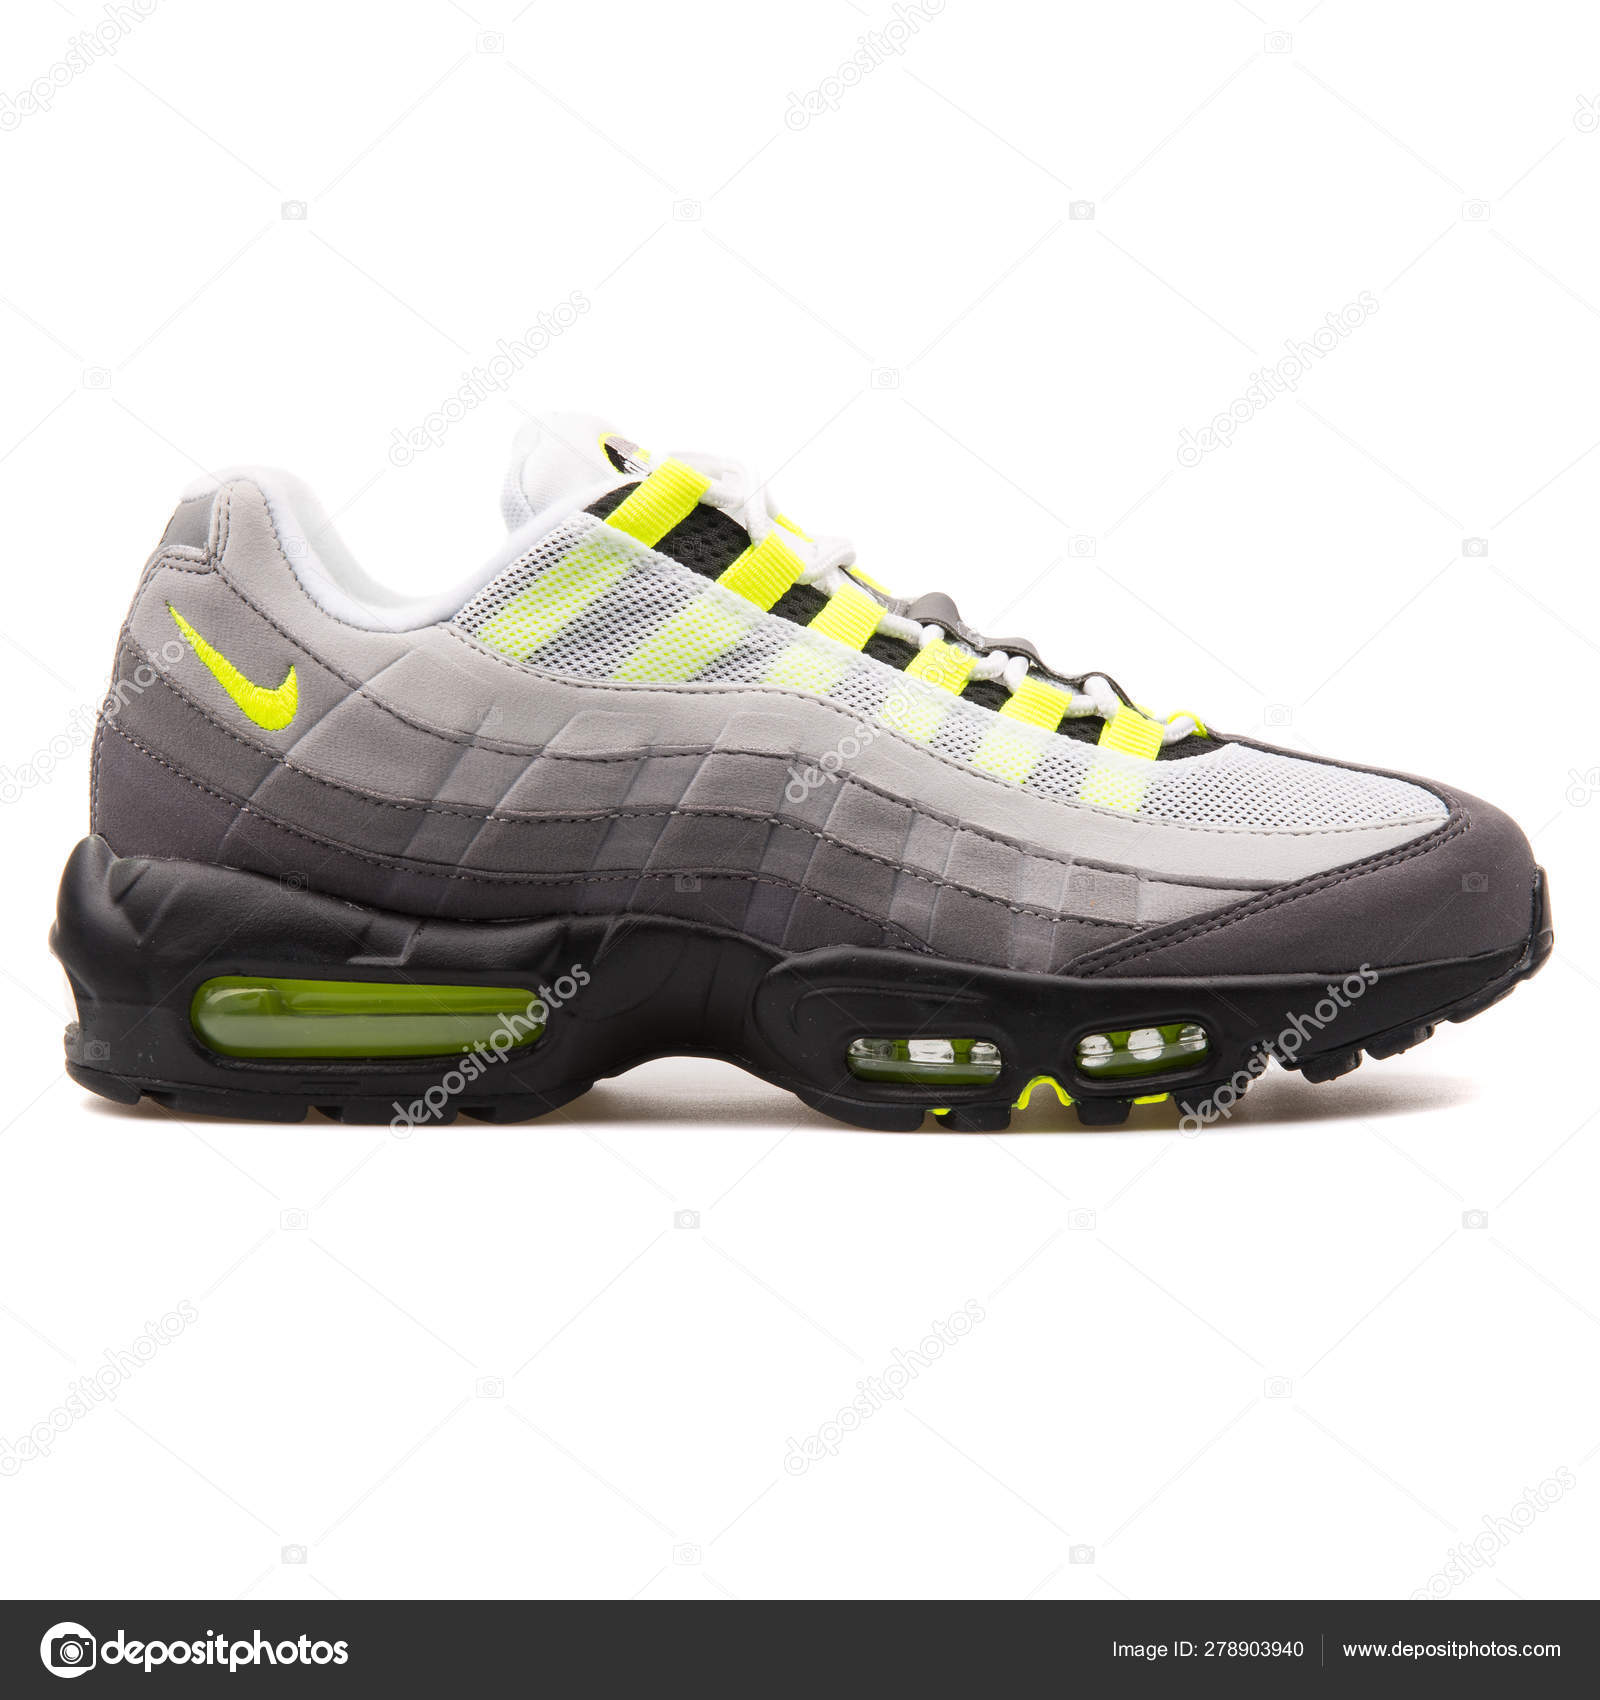 size 40 d8ac7 543b6 Images: air max 95 | Nike Air Max 95 OG grey, black and ...